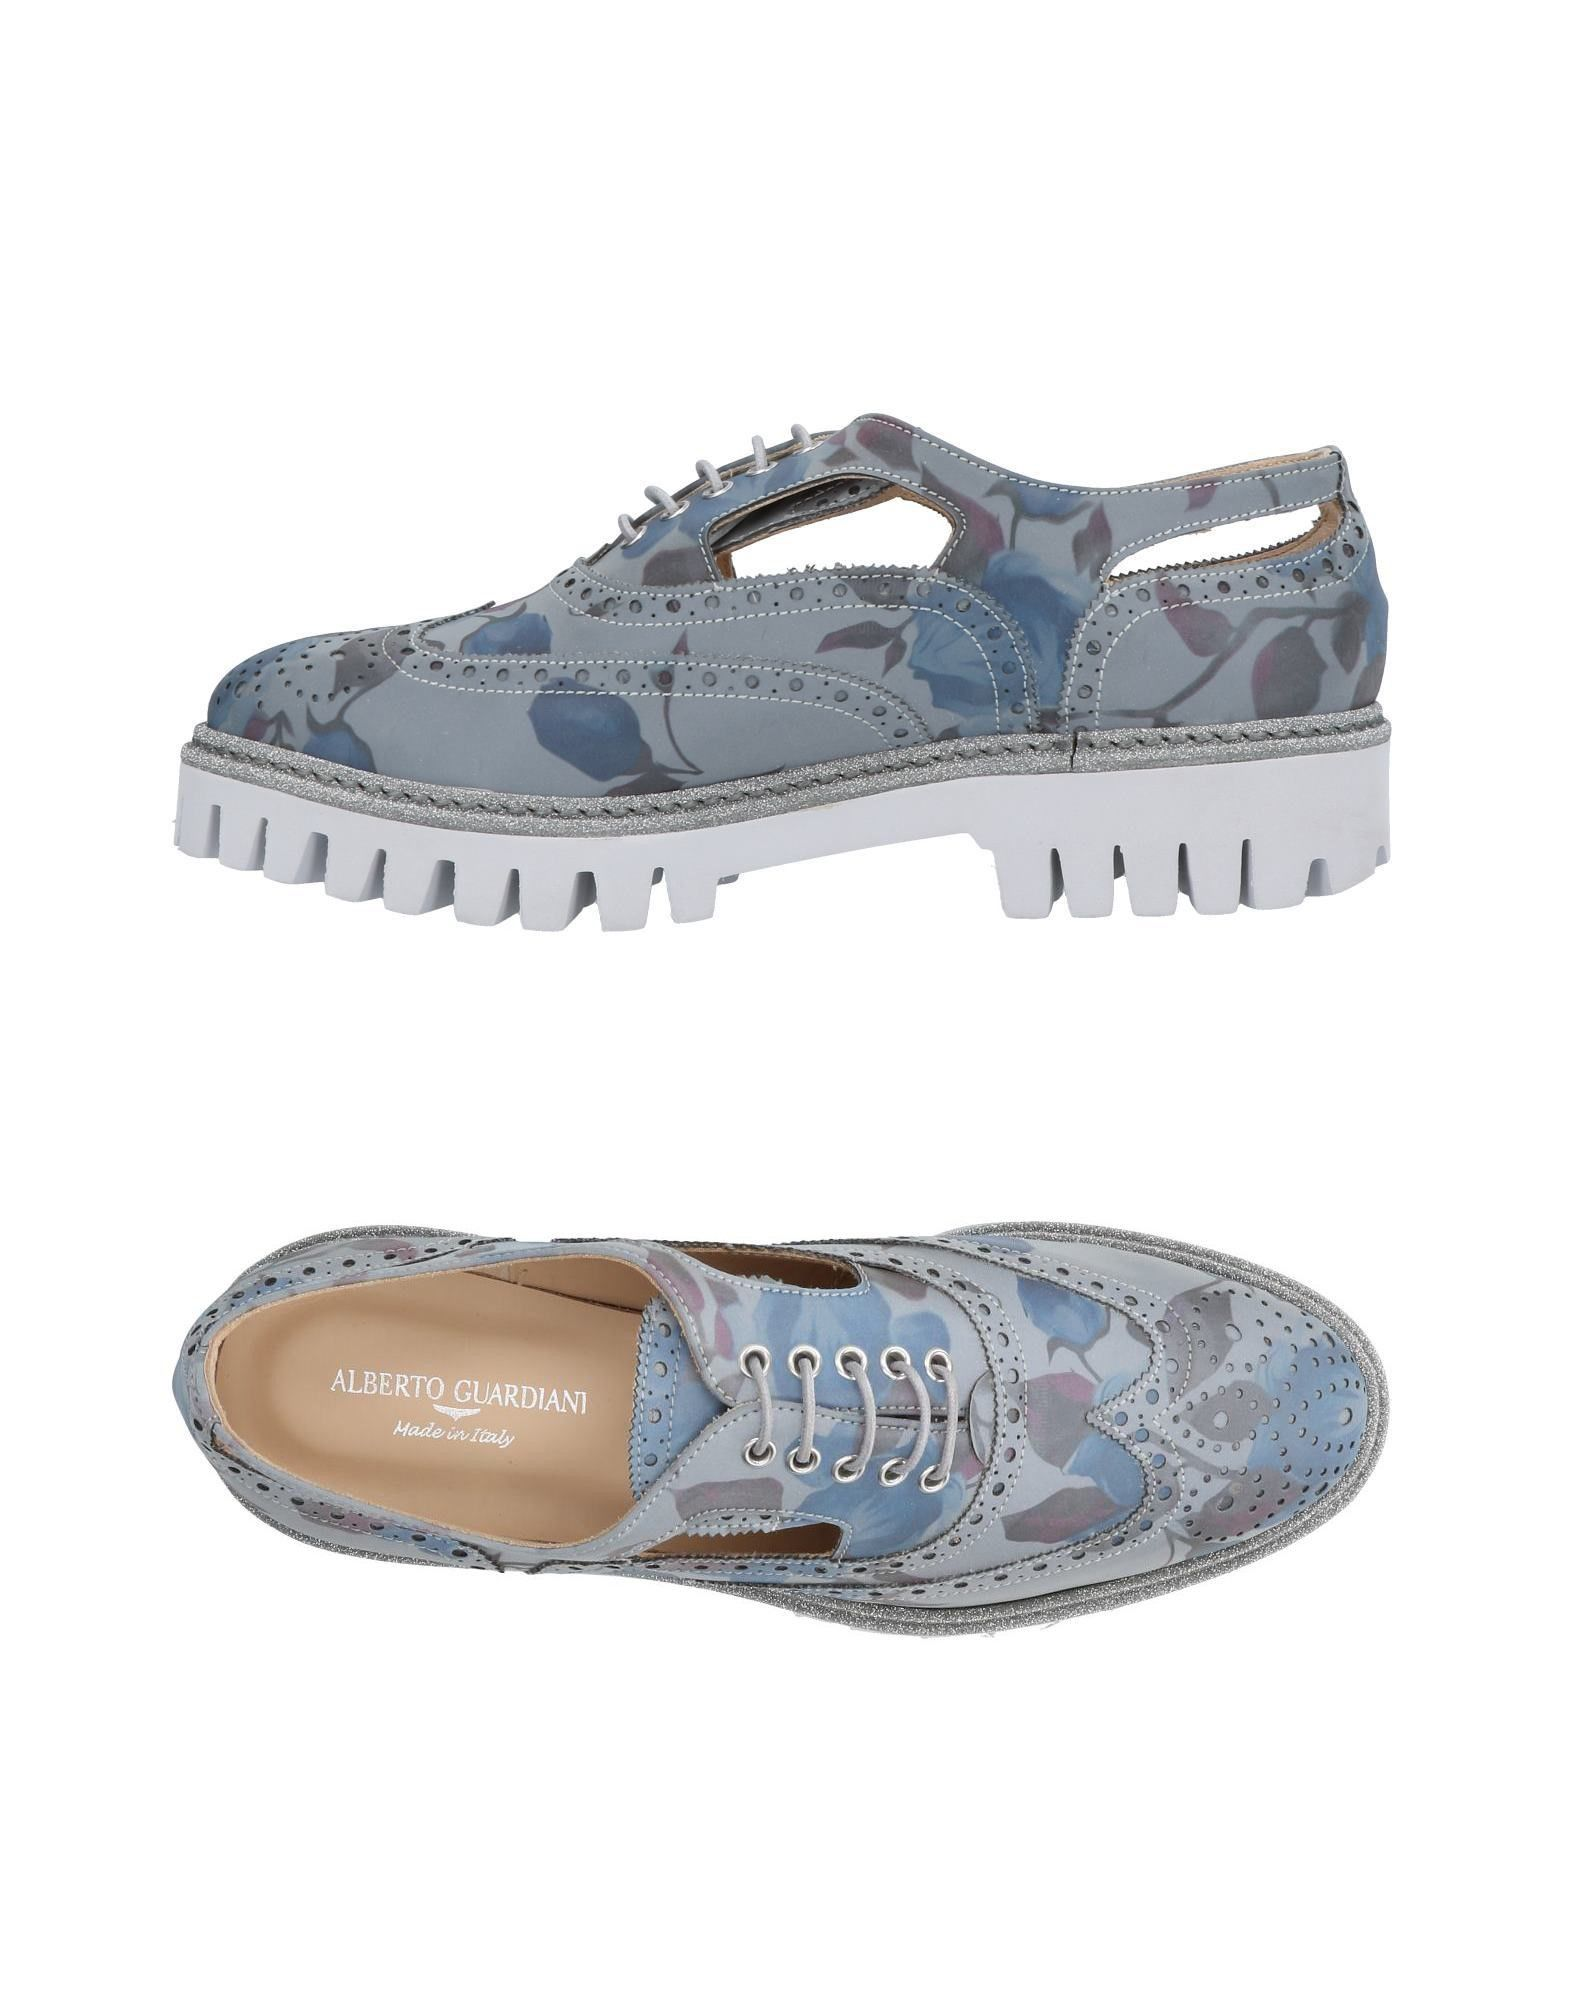 Alberto Guardiani Schnürschuhe Damen  11426352KE Gute Qualität beliebte Schuhe